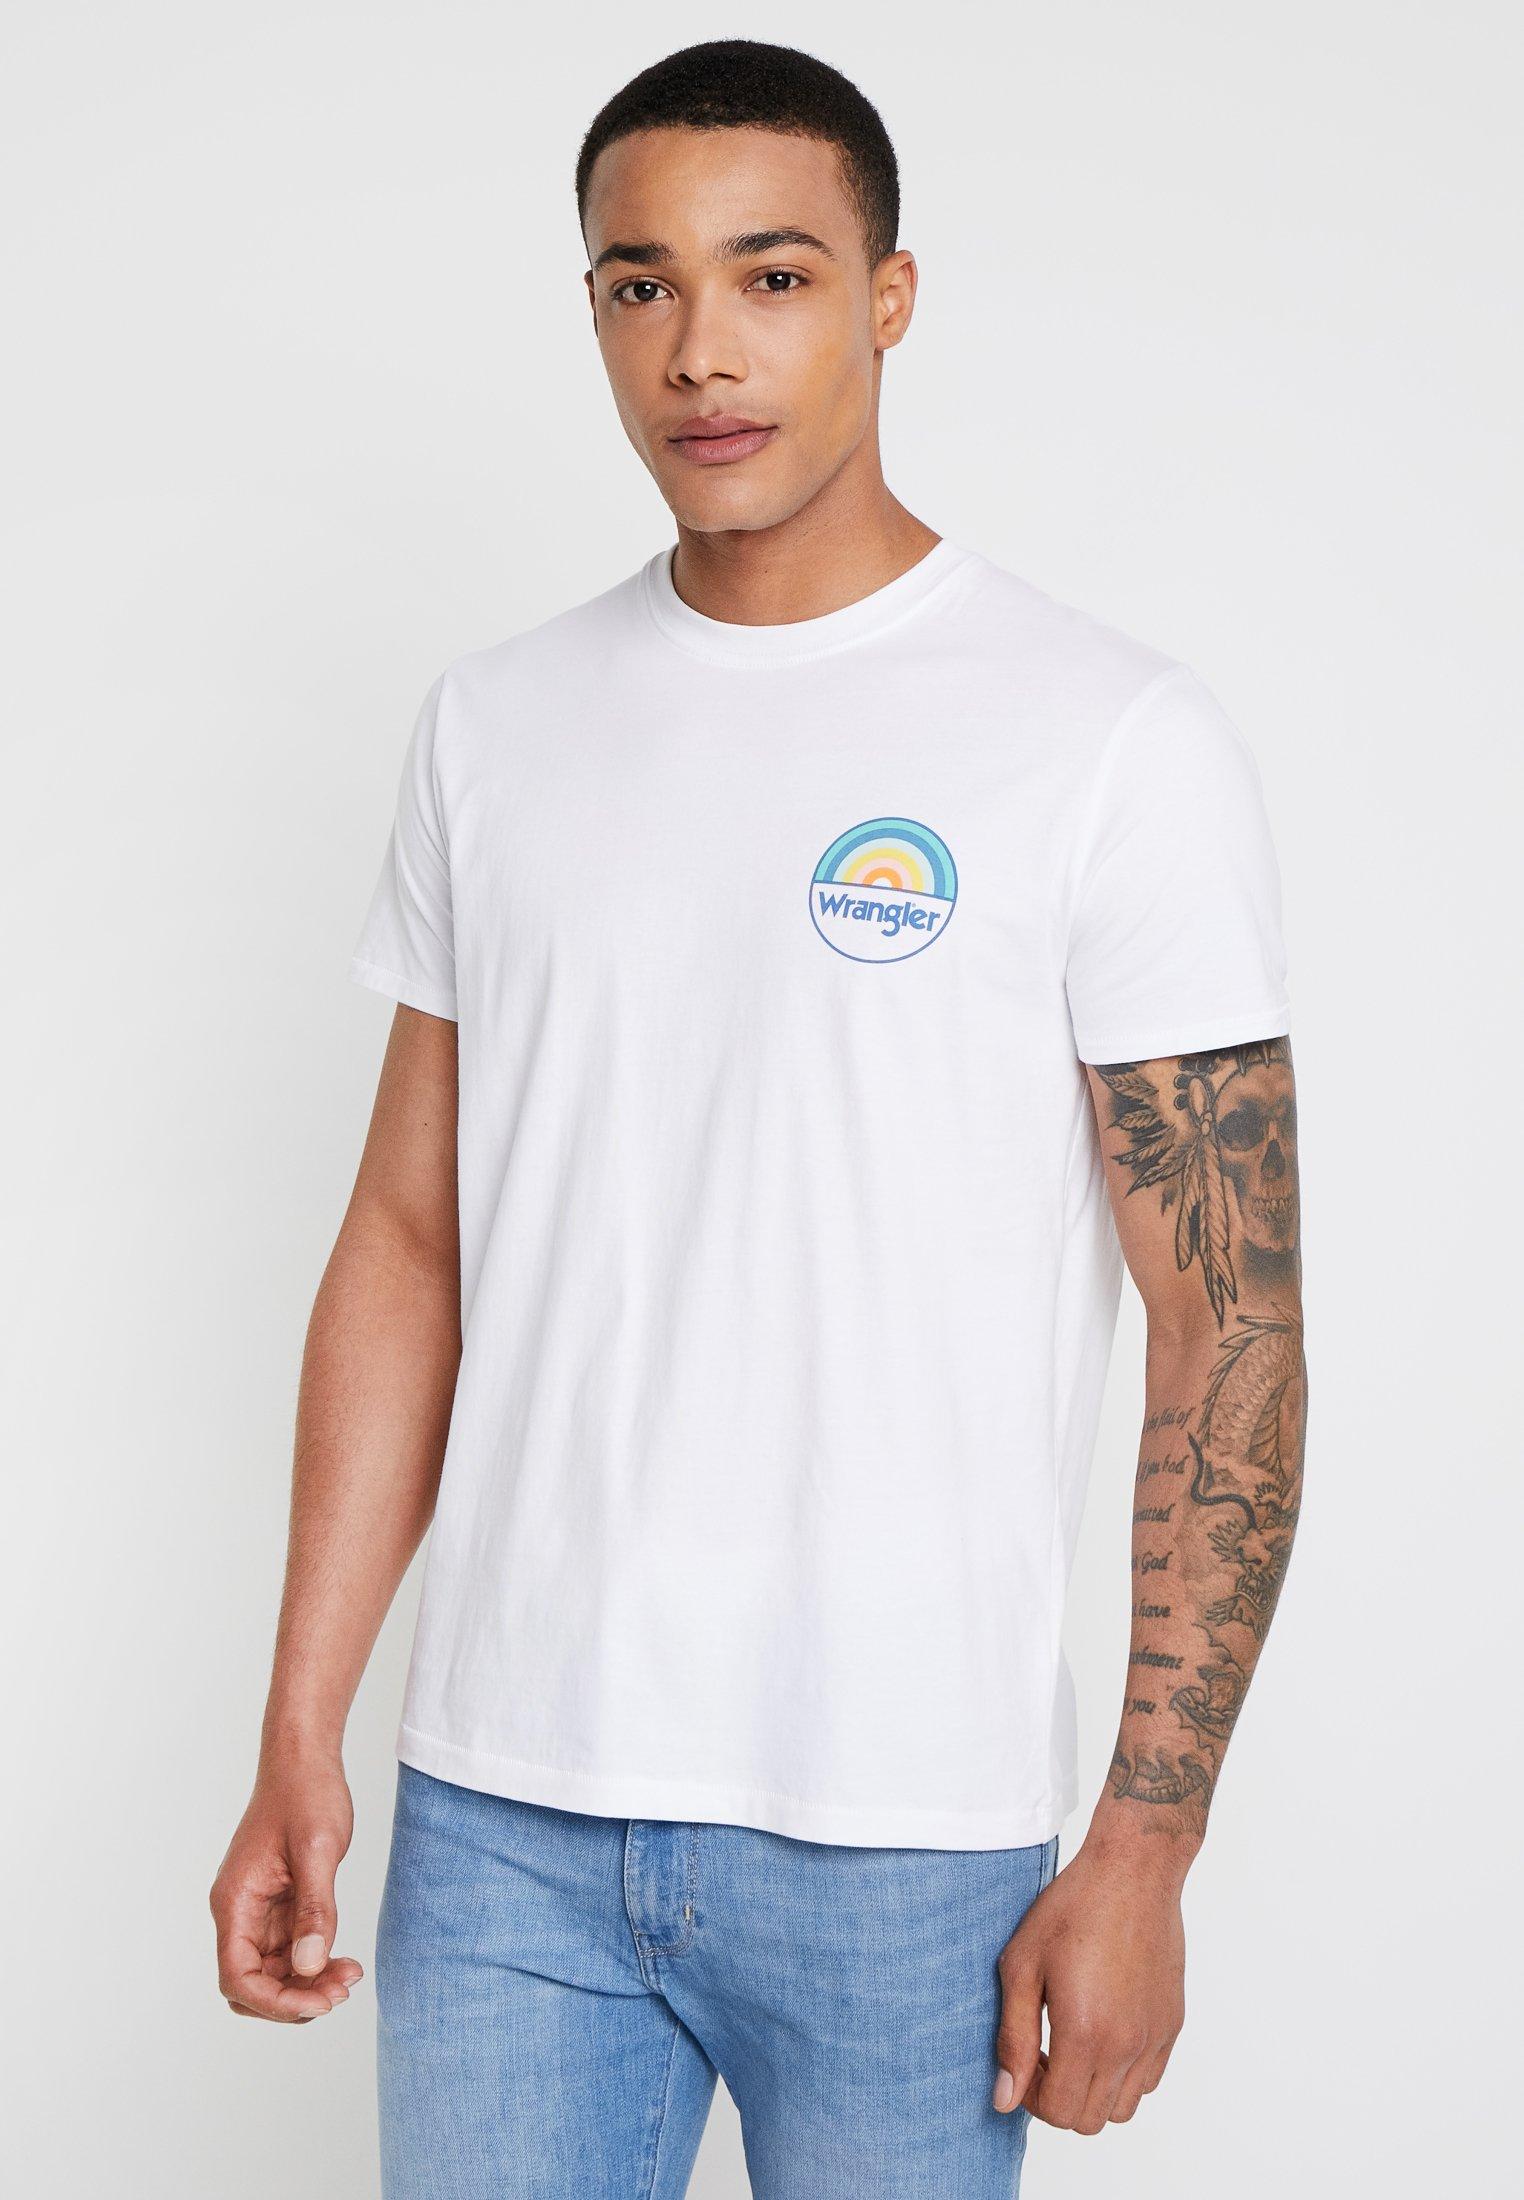 Wrangler Rainbow White TeeT shirt Imprimé vNmwOn80